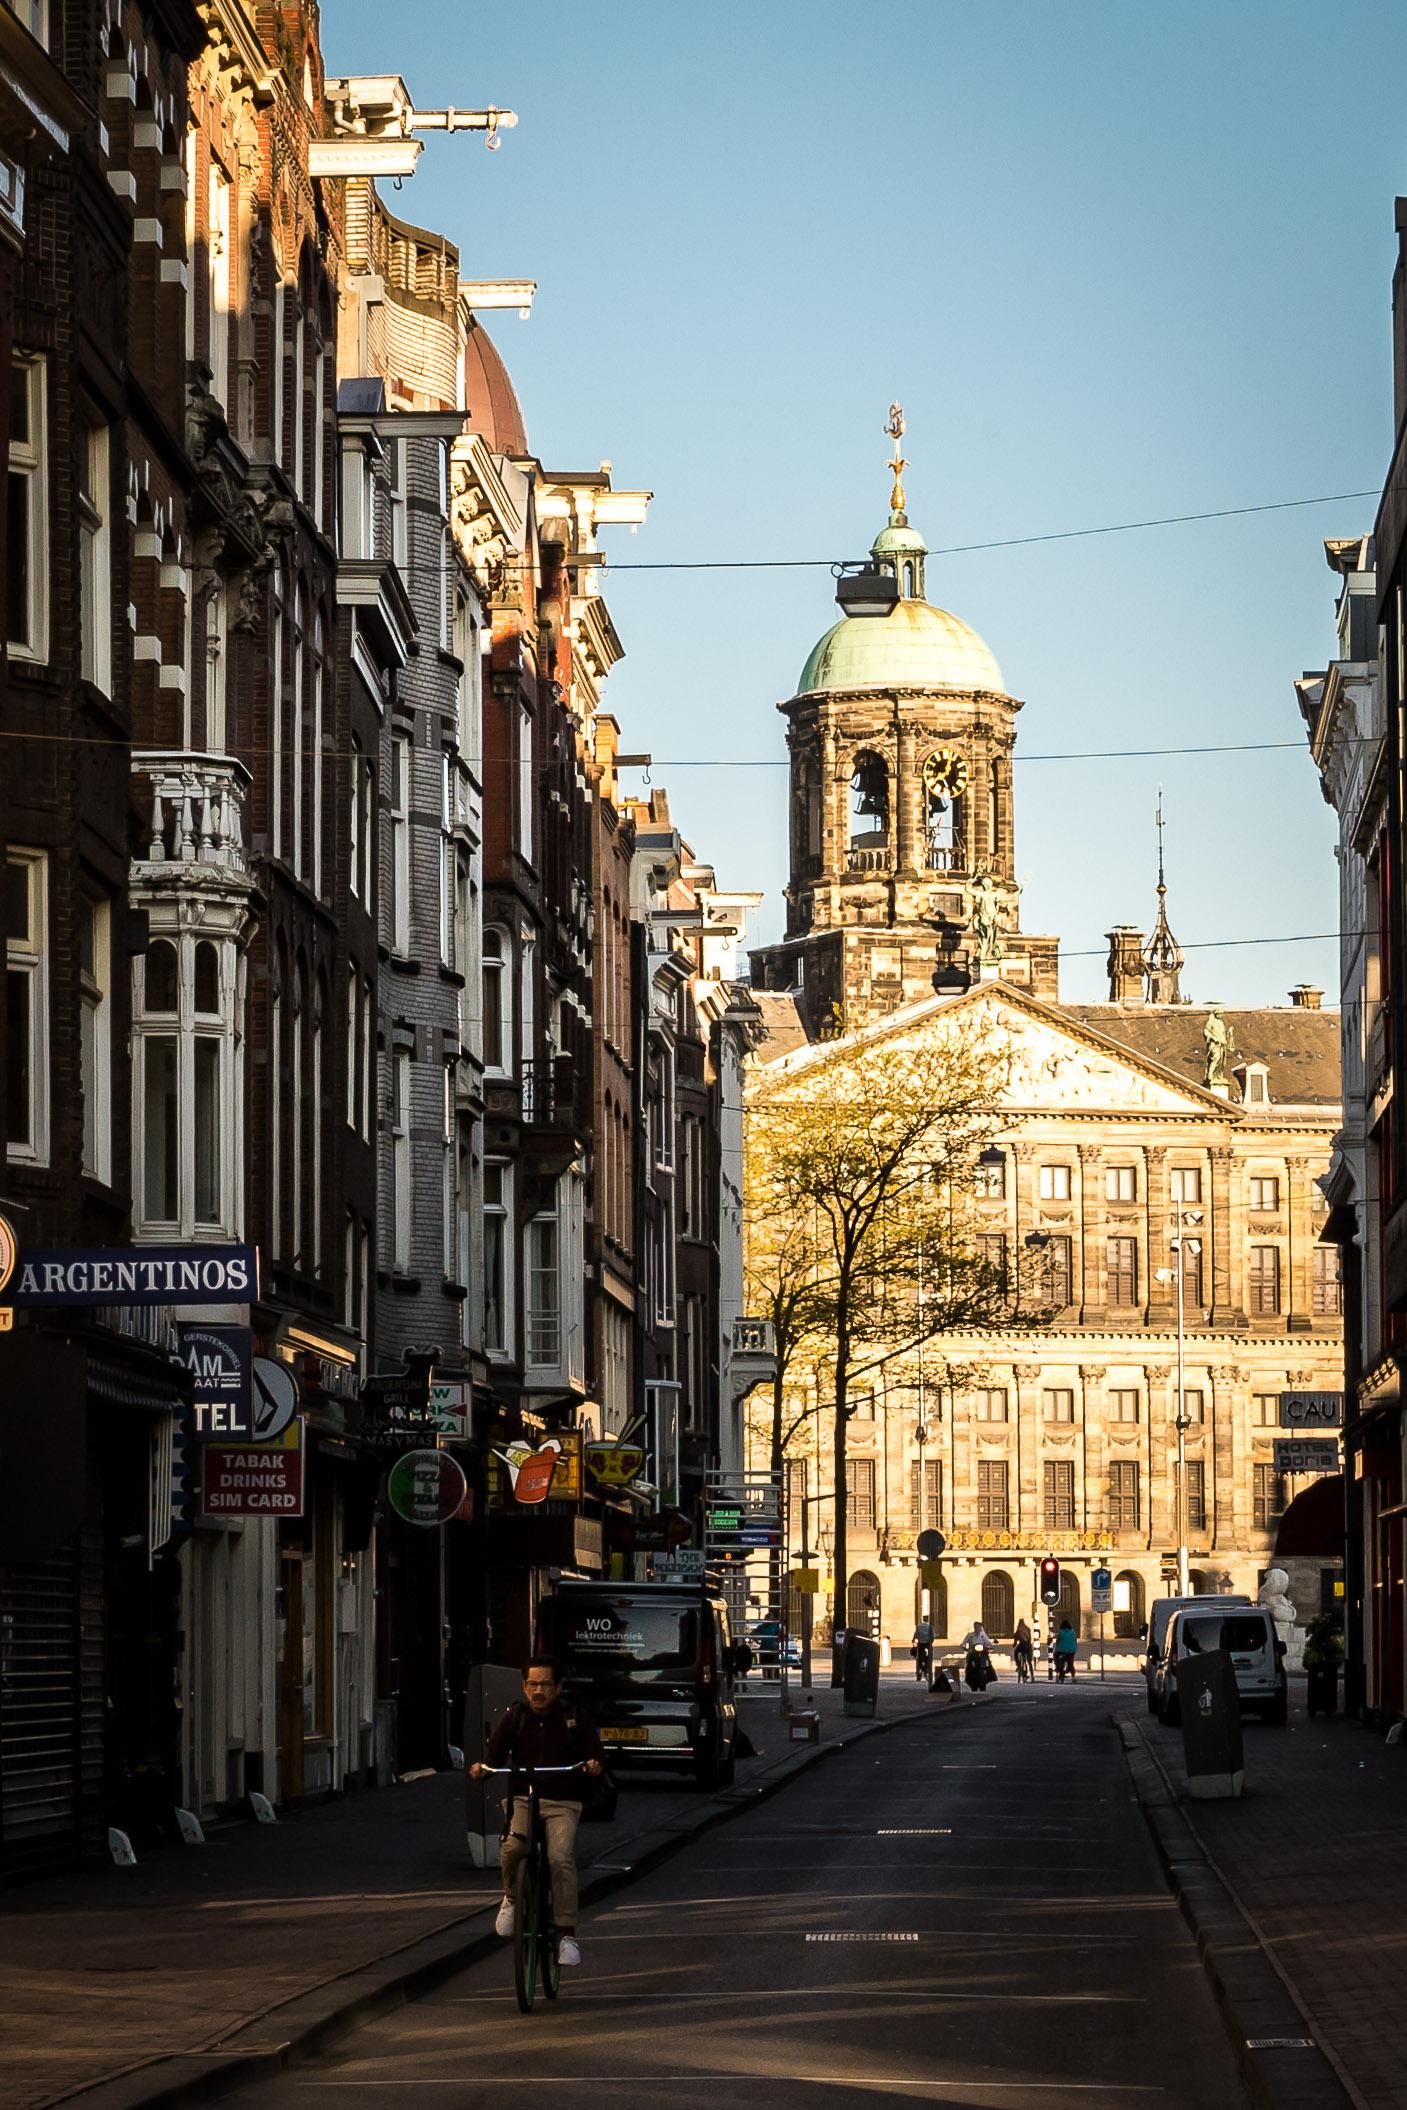 Muisstil Amsterdam (Ashkan Mortezapour Photography) (2 of 6)